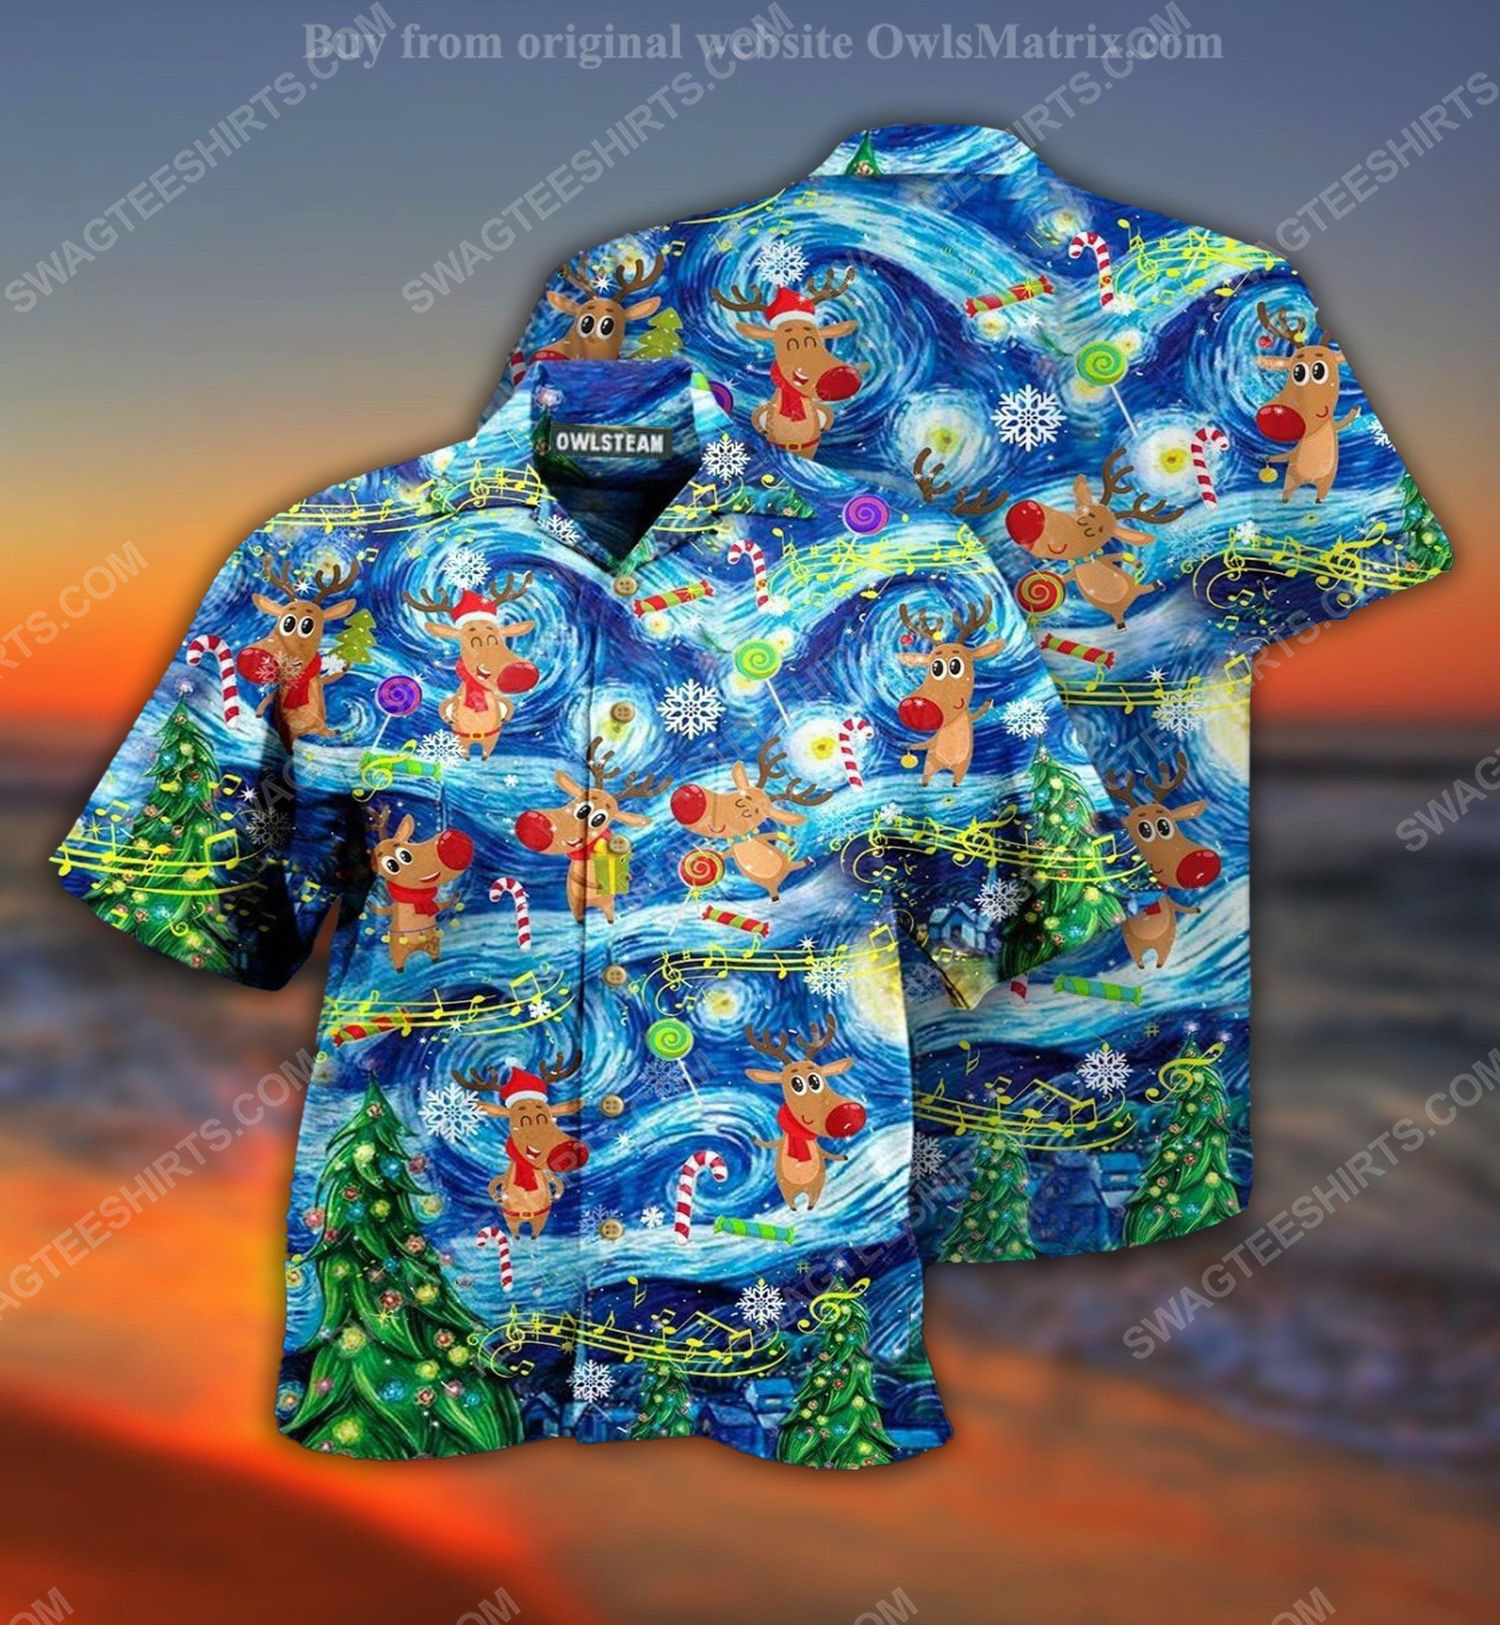 Christmas holiday starry night reindeer full print hawaiian shirt 1 - Copy (2)